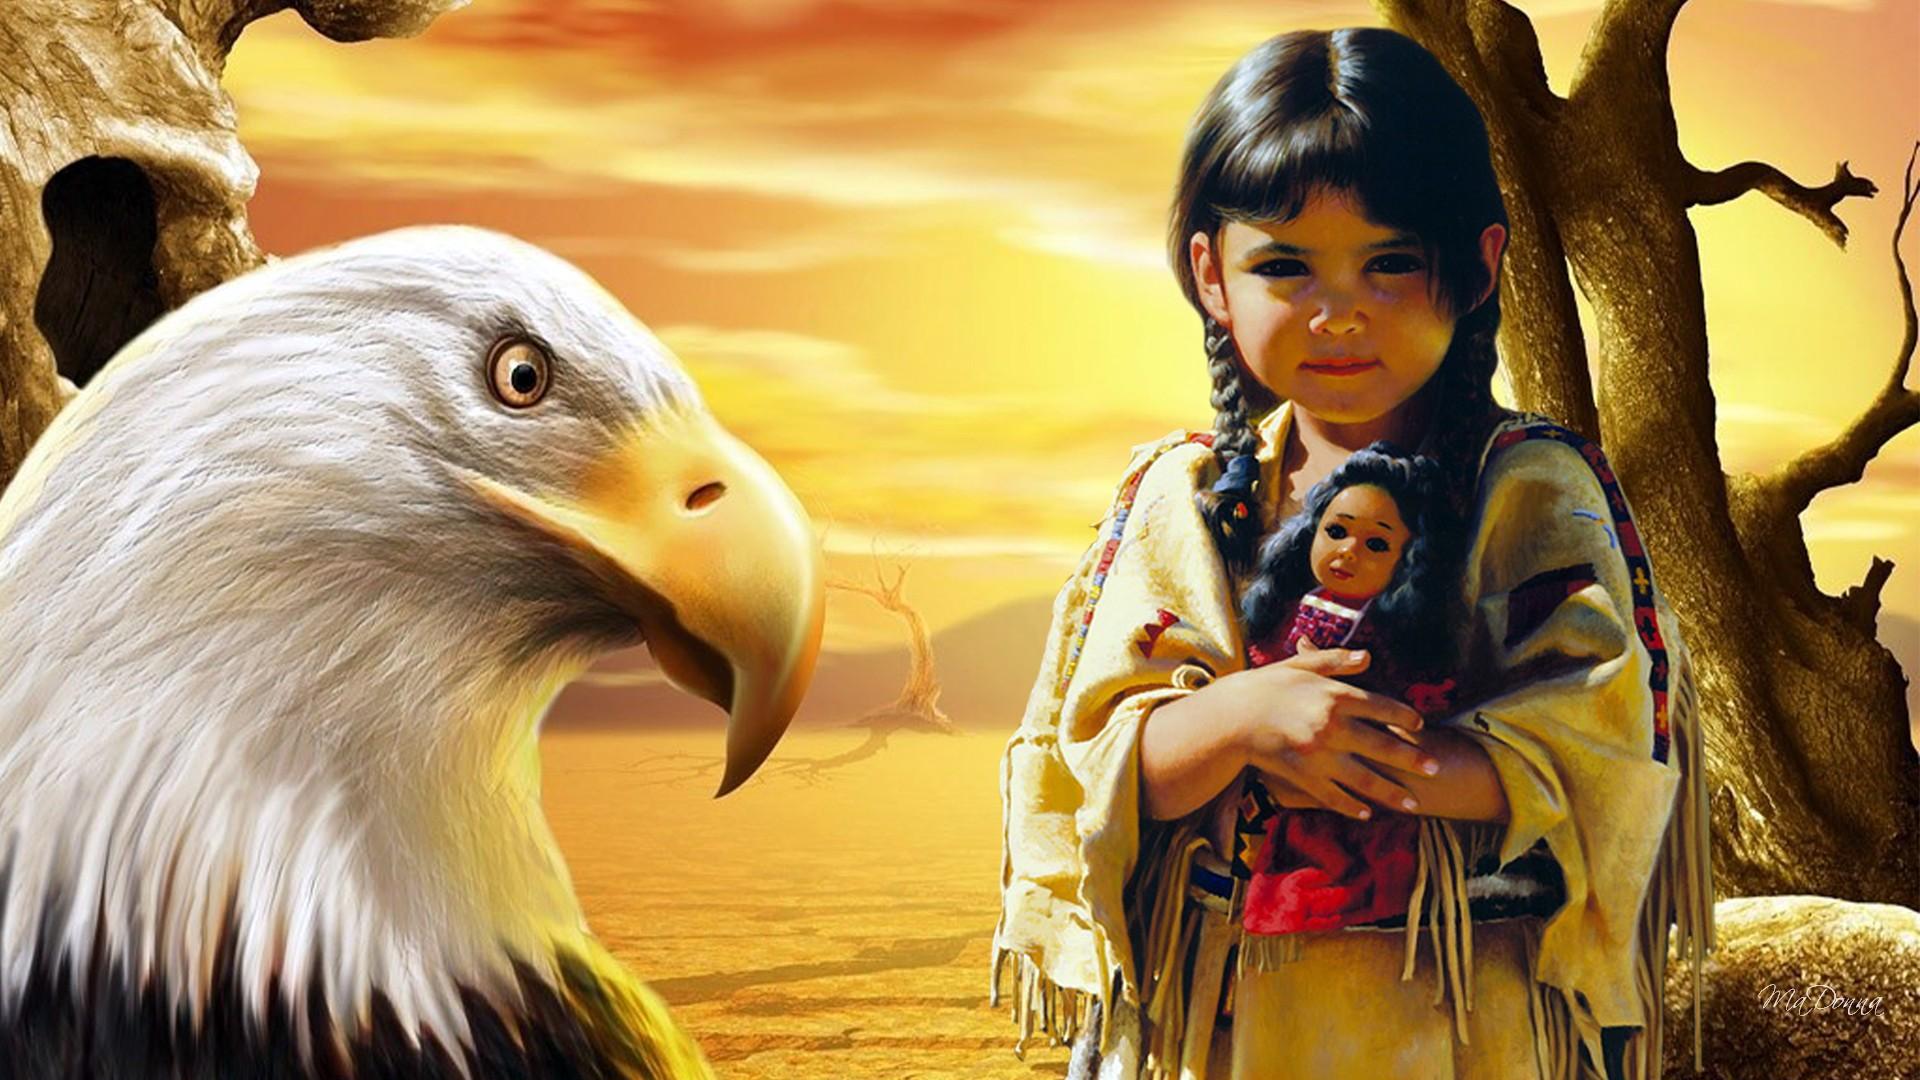 Native American   Native Americans Wallpaper 34175312 1920x1080